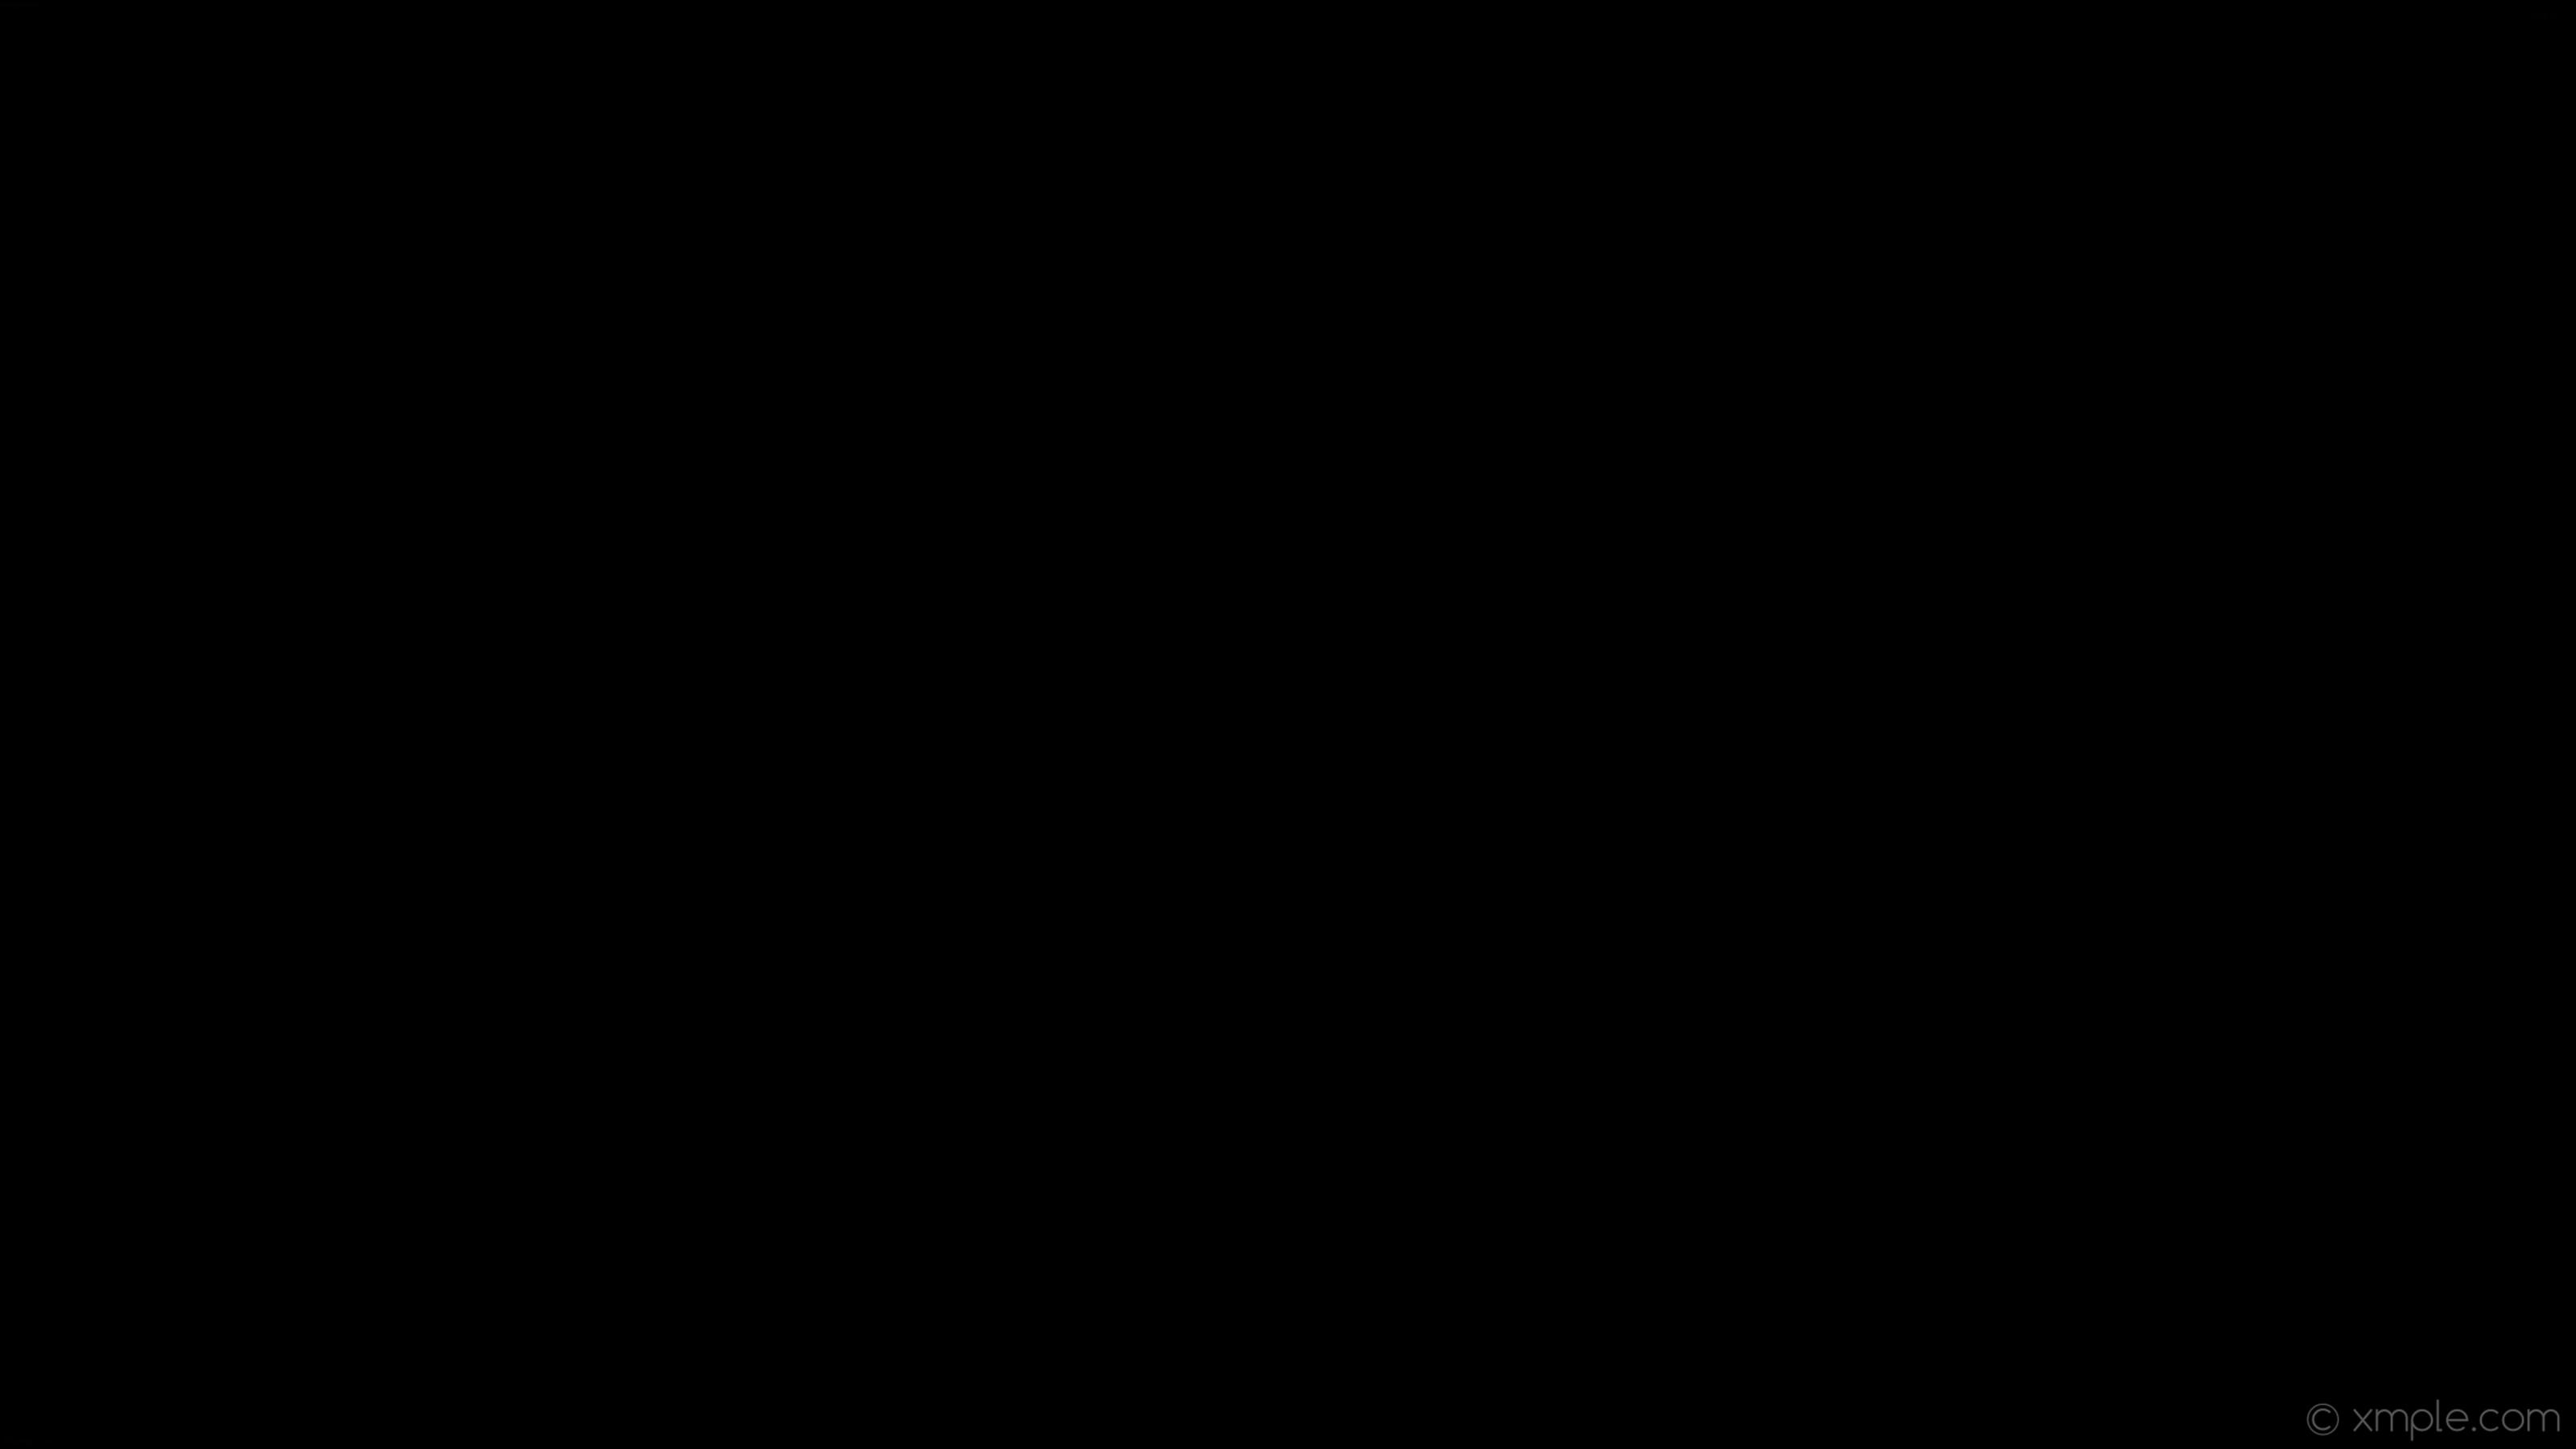 wallpaper glow hexagon green gradient white black #000000 #ffffff #008000  diagonal 45°